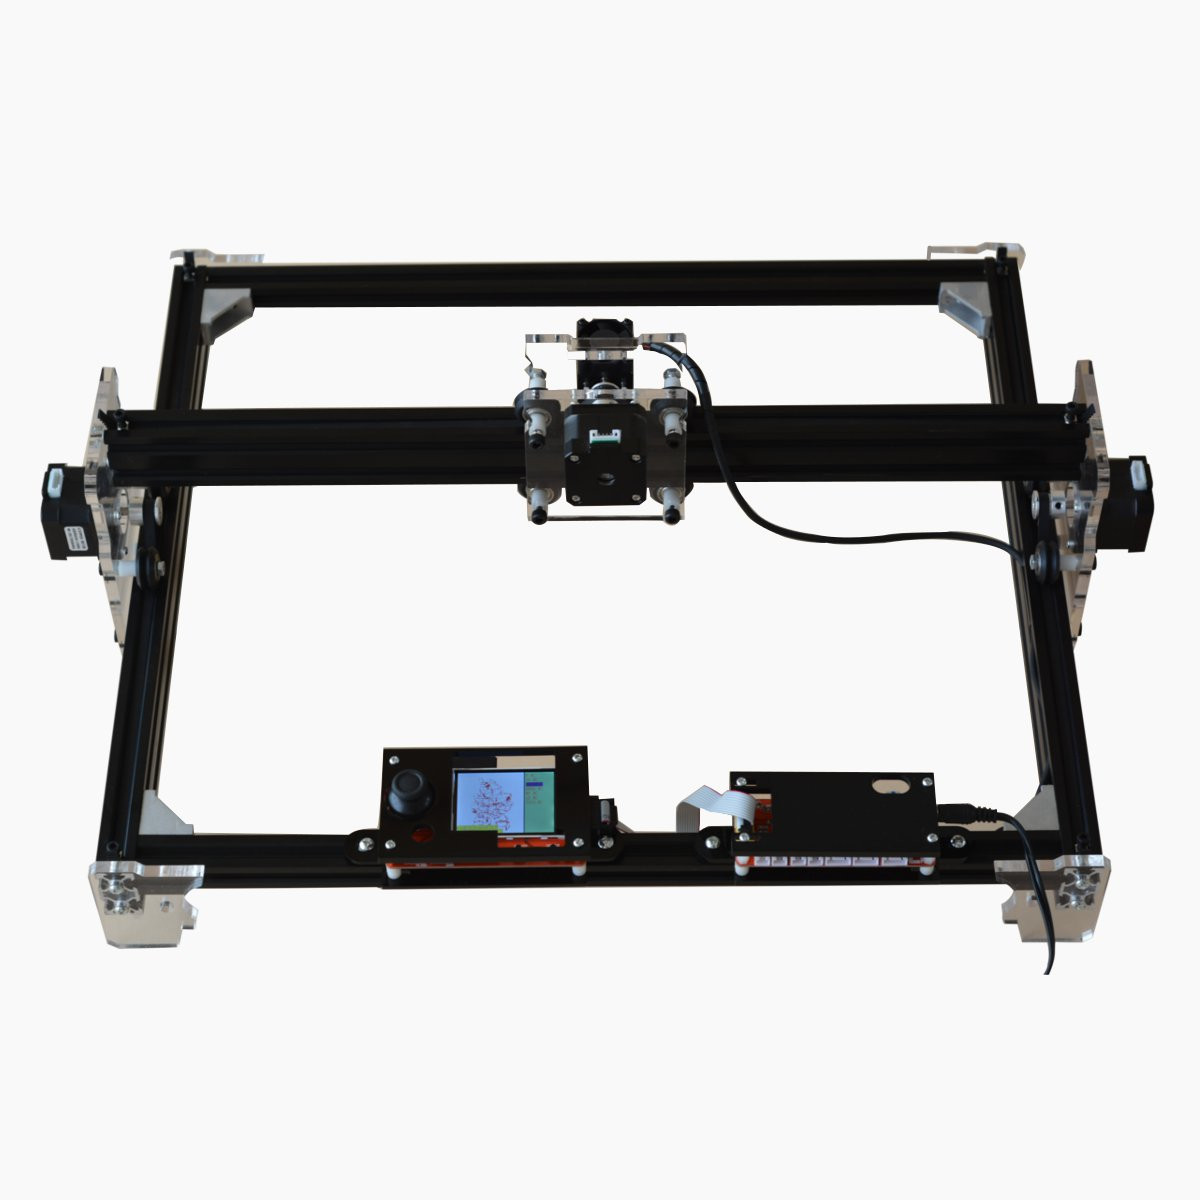 Other Gadgets A3 2500mw Diy Laser Engraving Machine Mini